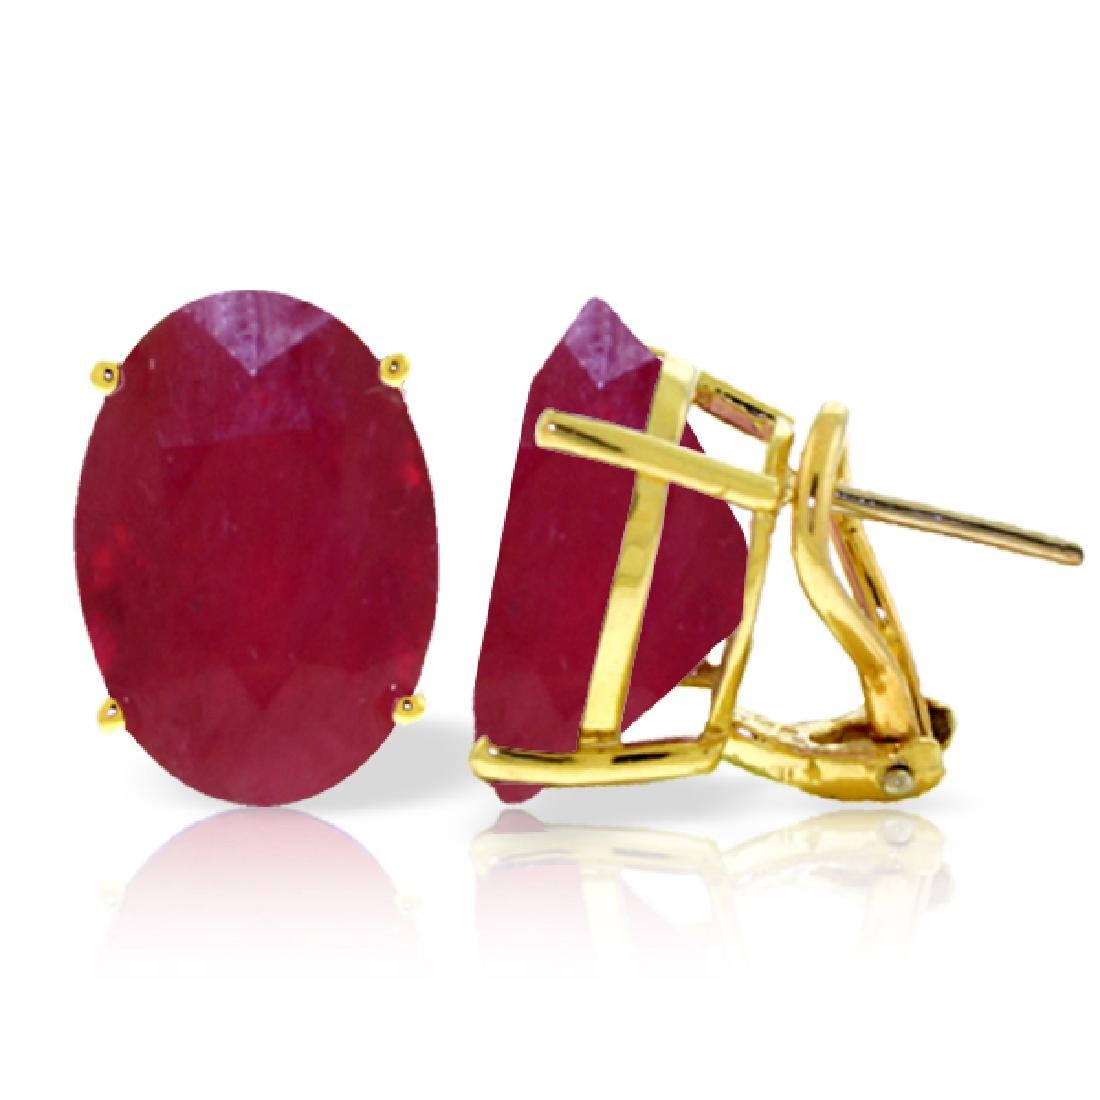 Genuine 15 ctw Ruby Earrings Jewelry 14KT Yellow Gold -